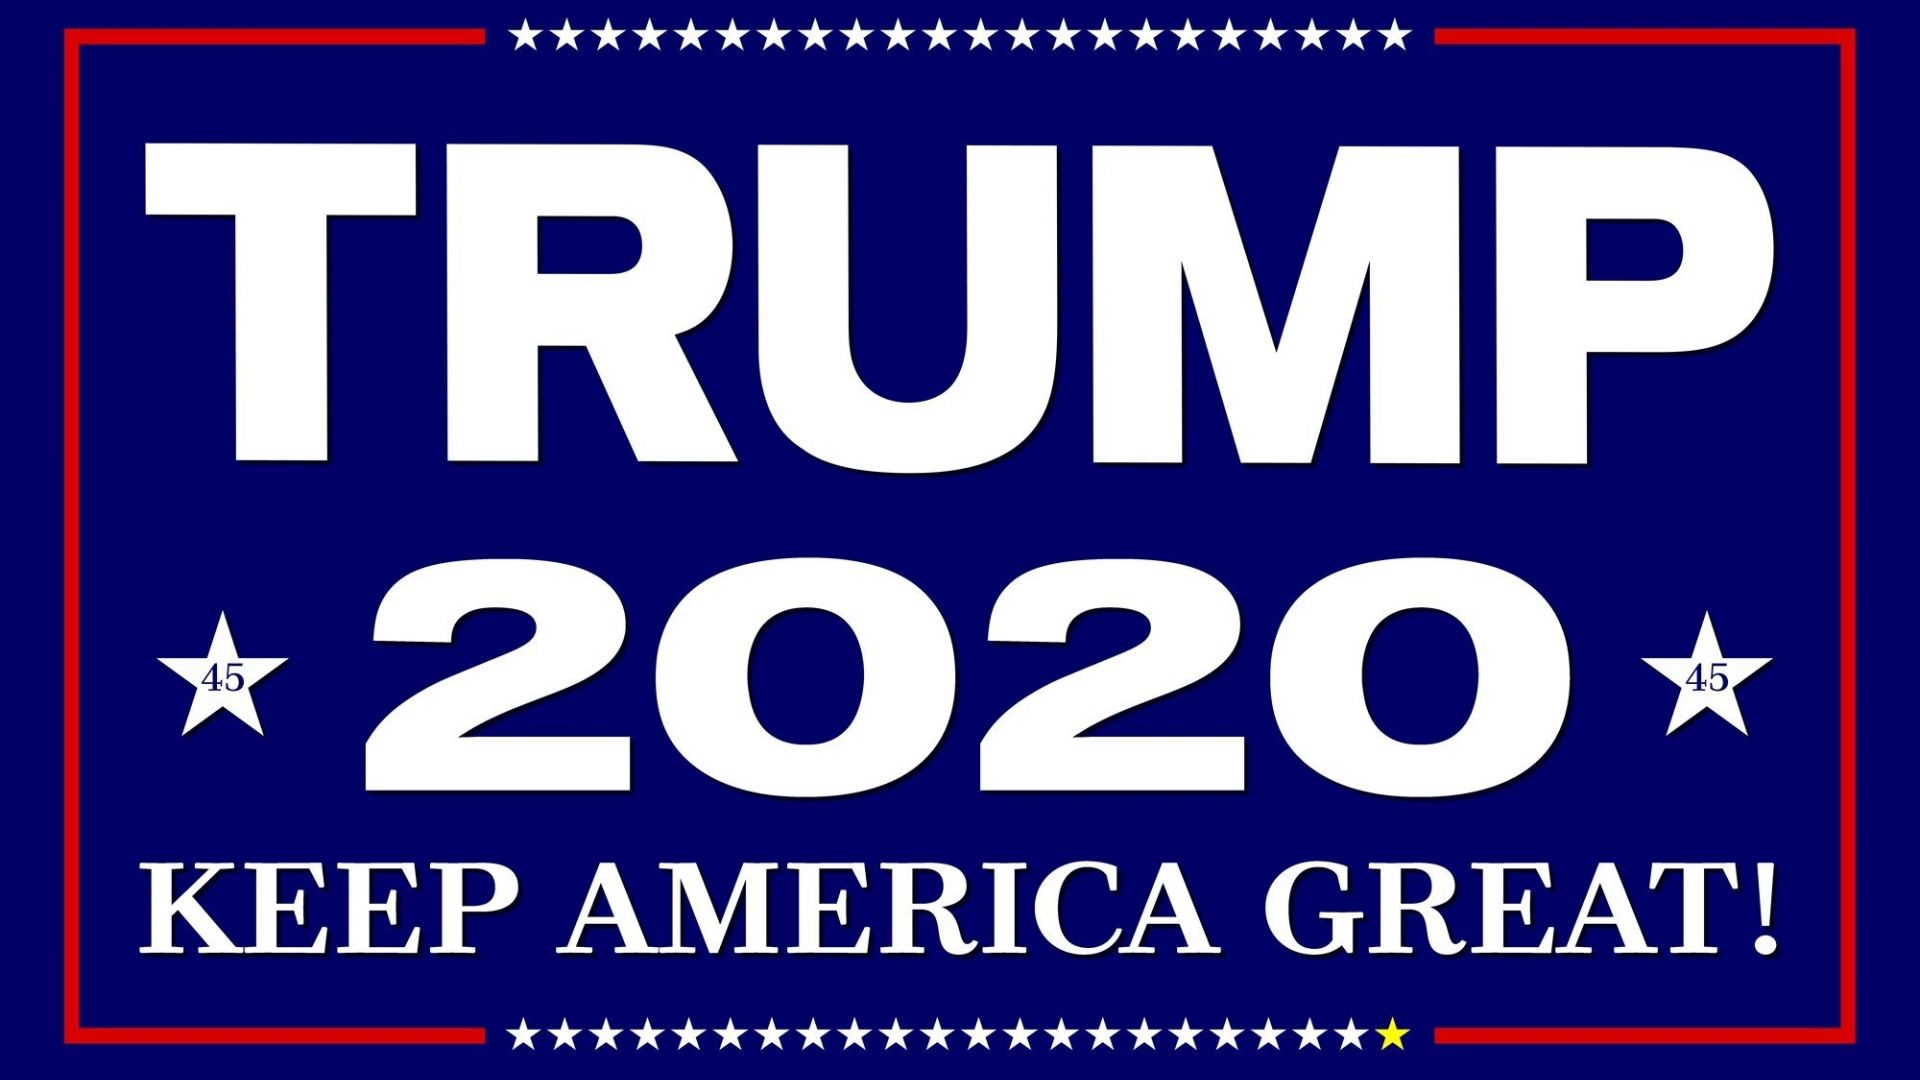 Trump 2020 Wallpapers - Top Free Trump 2020 Backgrounds ...